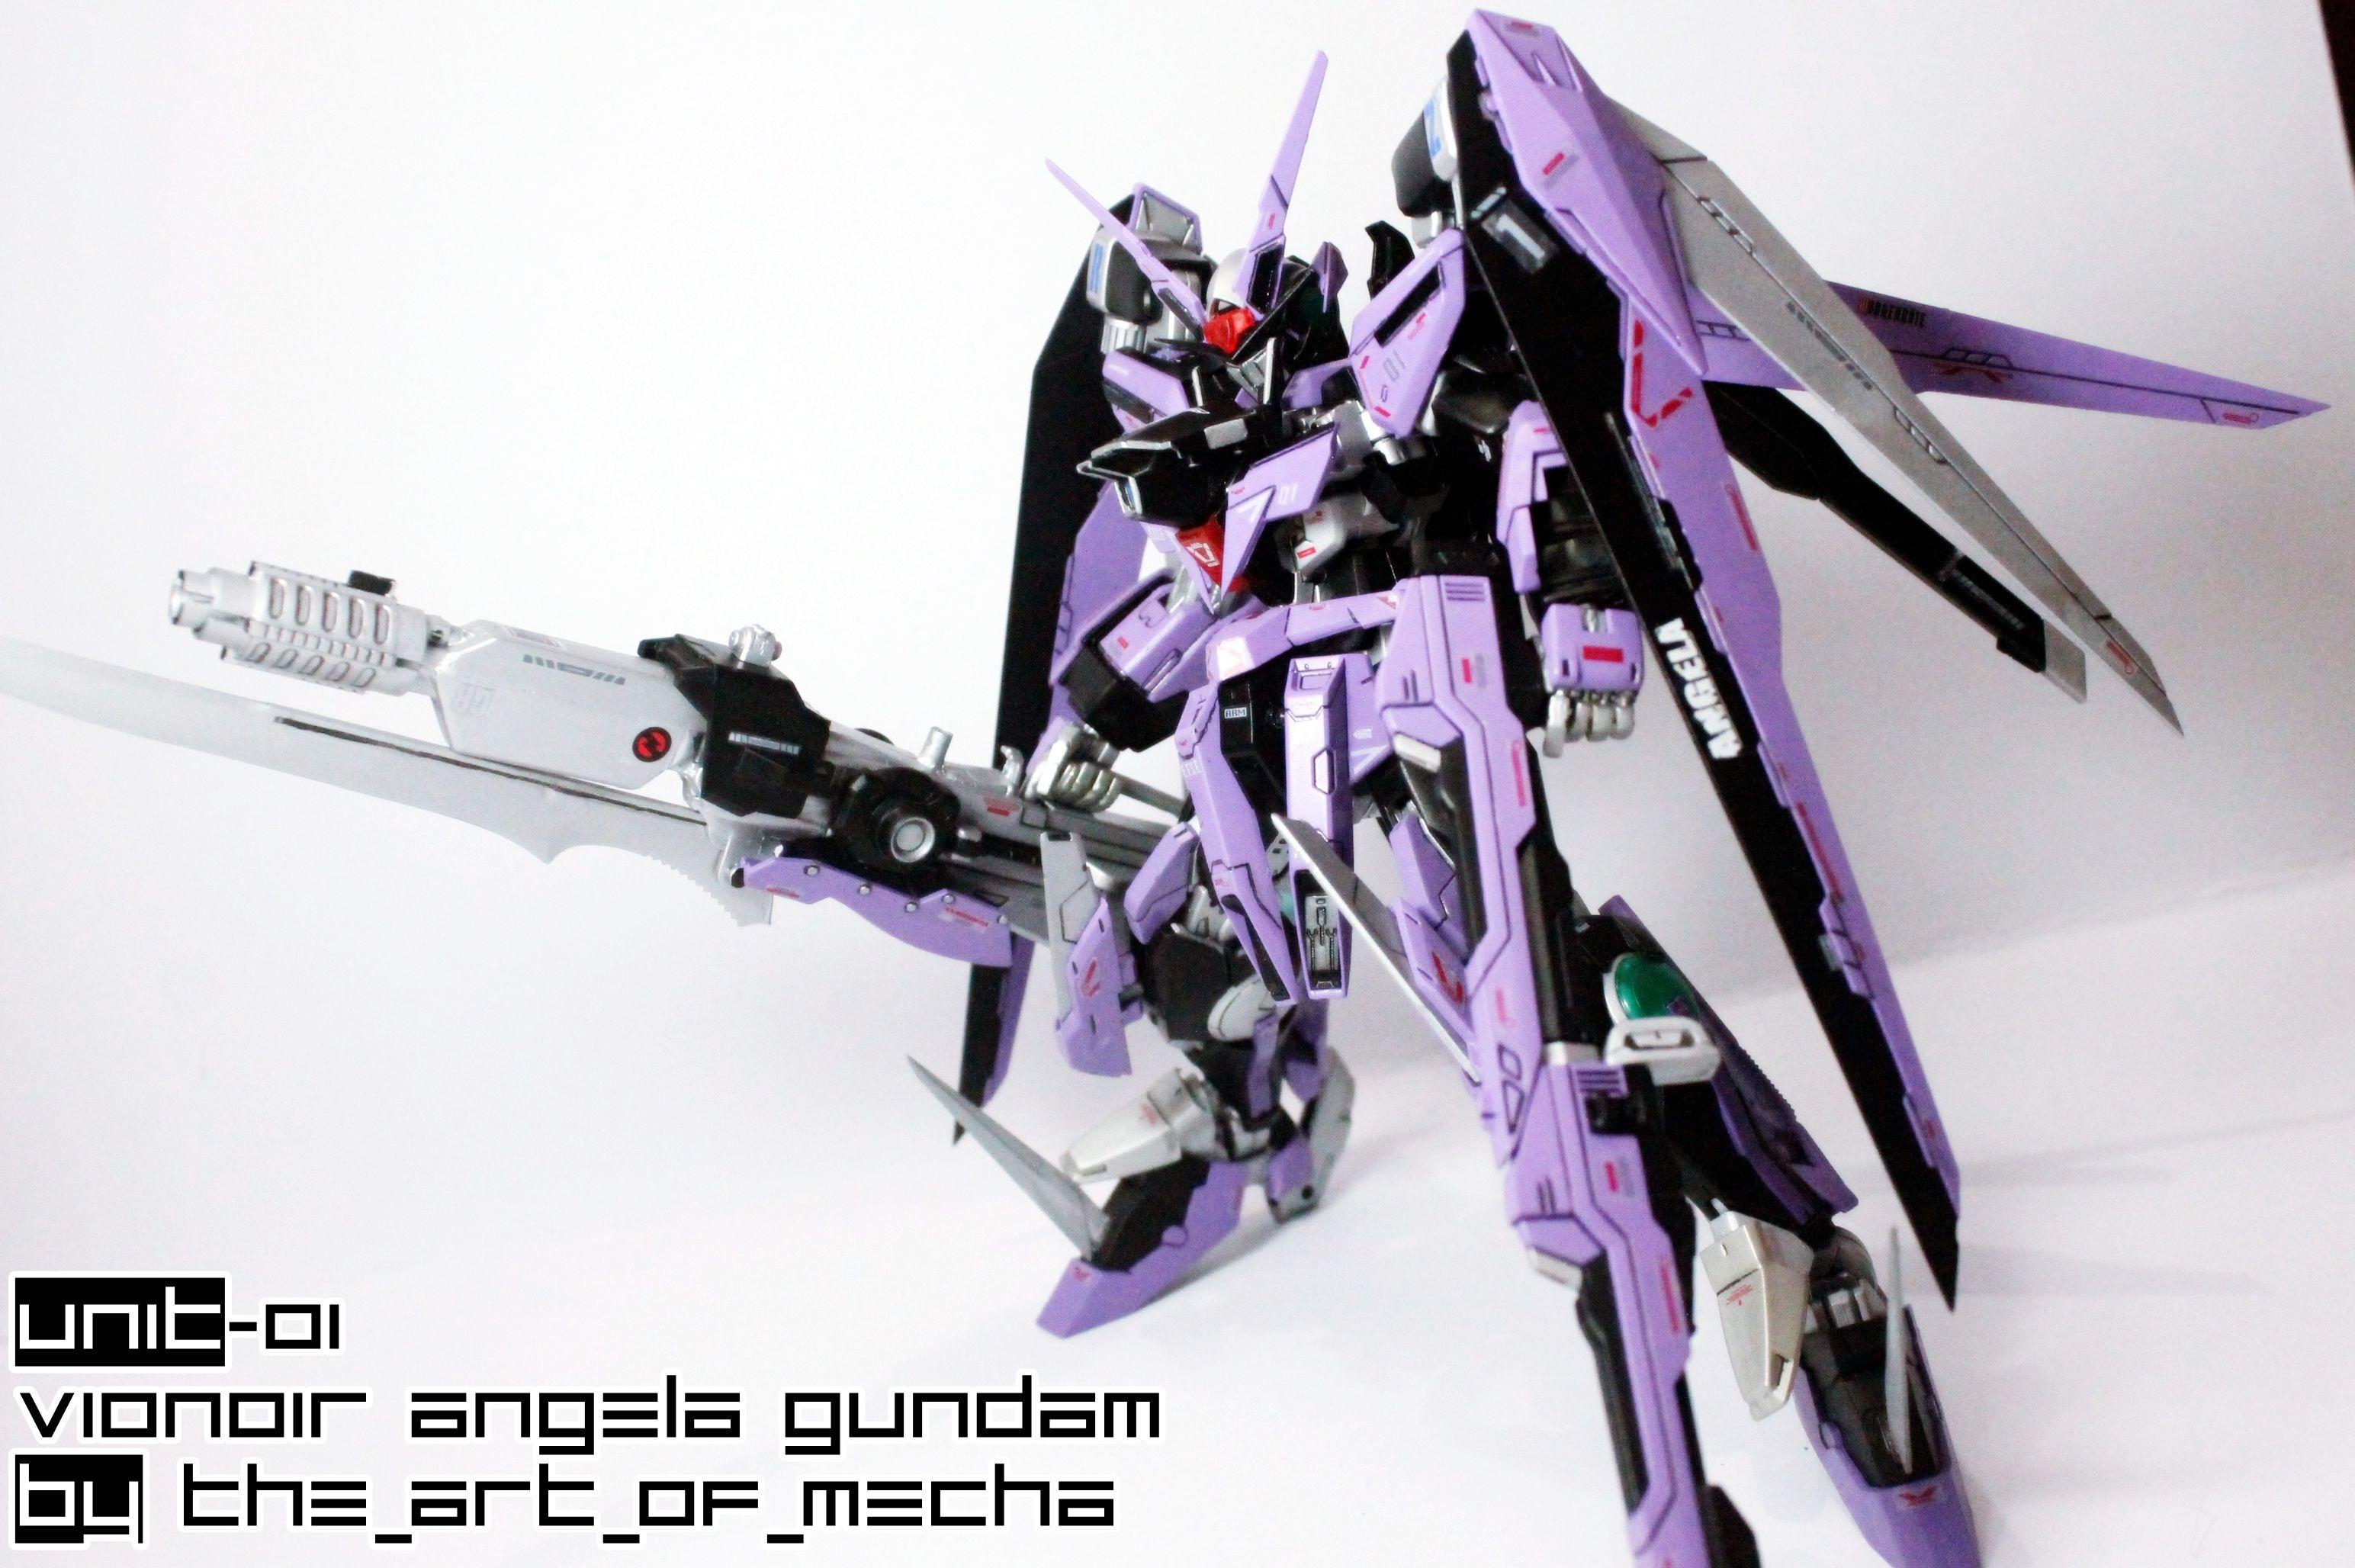 MG 00 Raiser Custom: Unit 01 Vionoir Angela Gundam. Work by Eizy. Photoreview http://www.gunjap.net/site/?p=243844